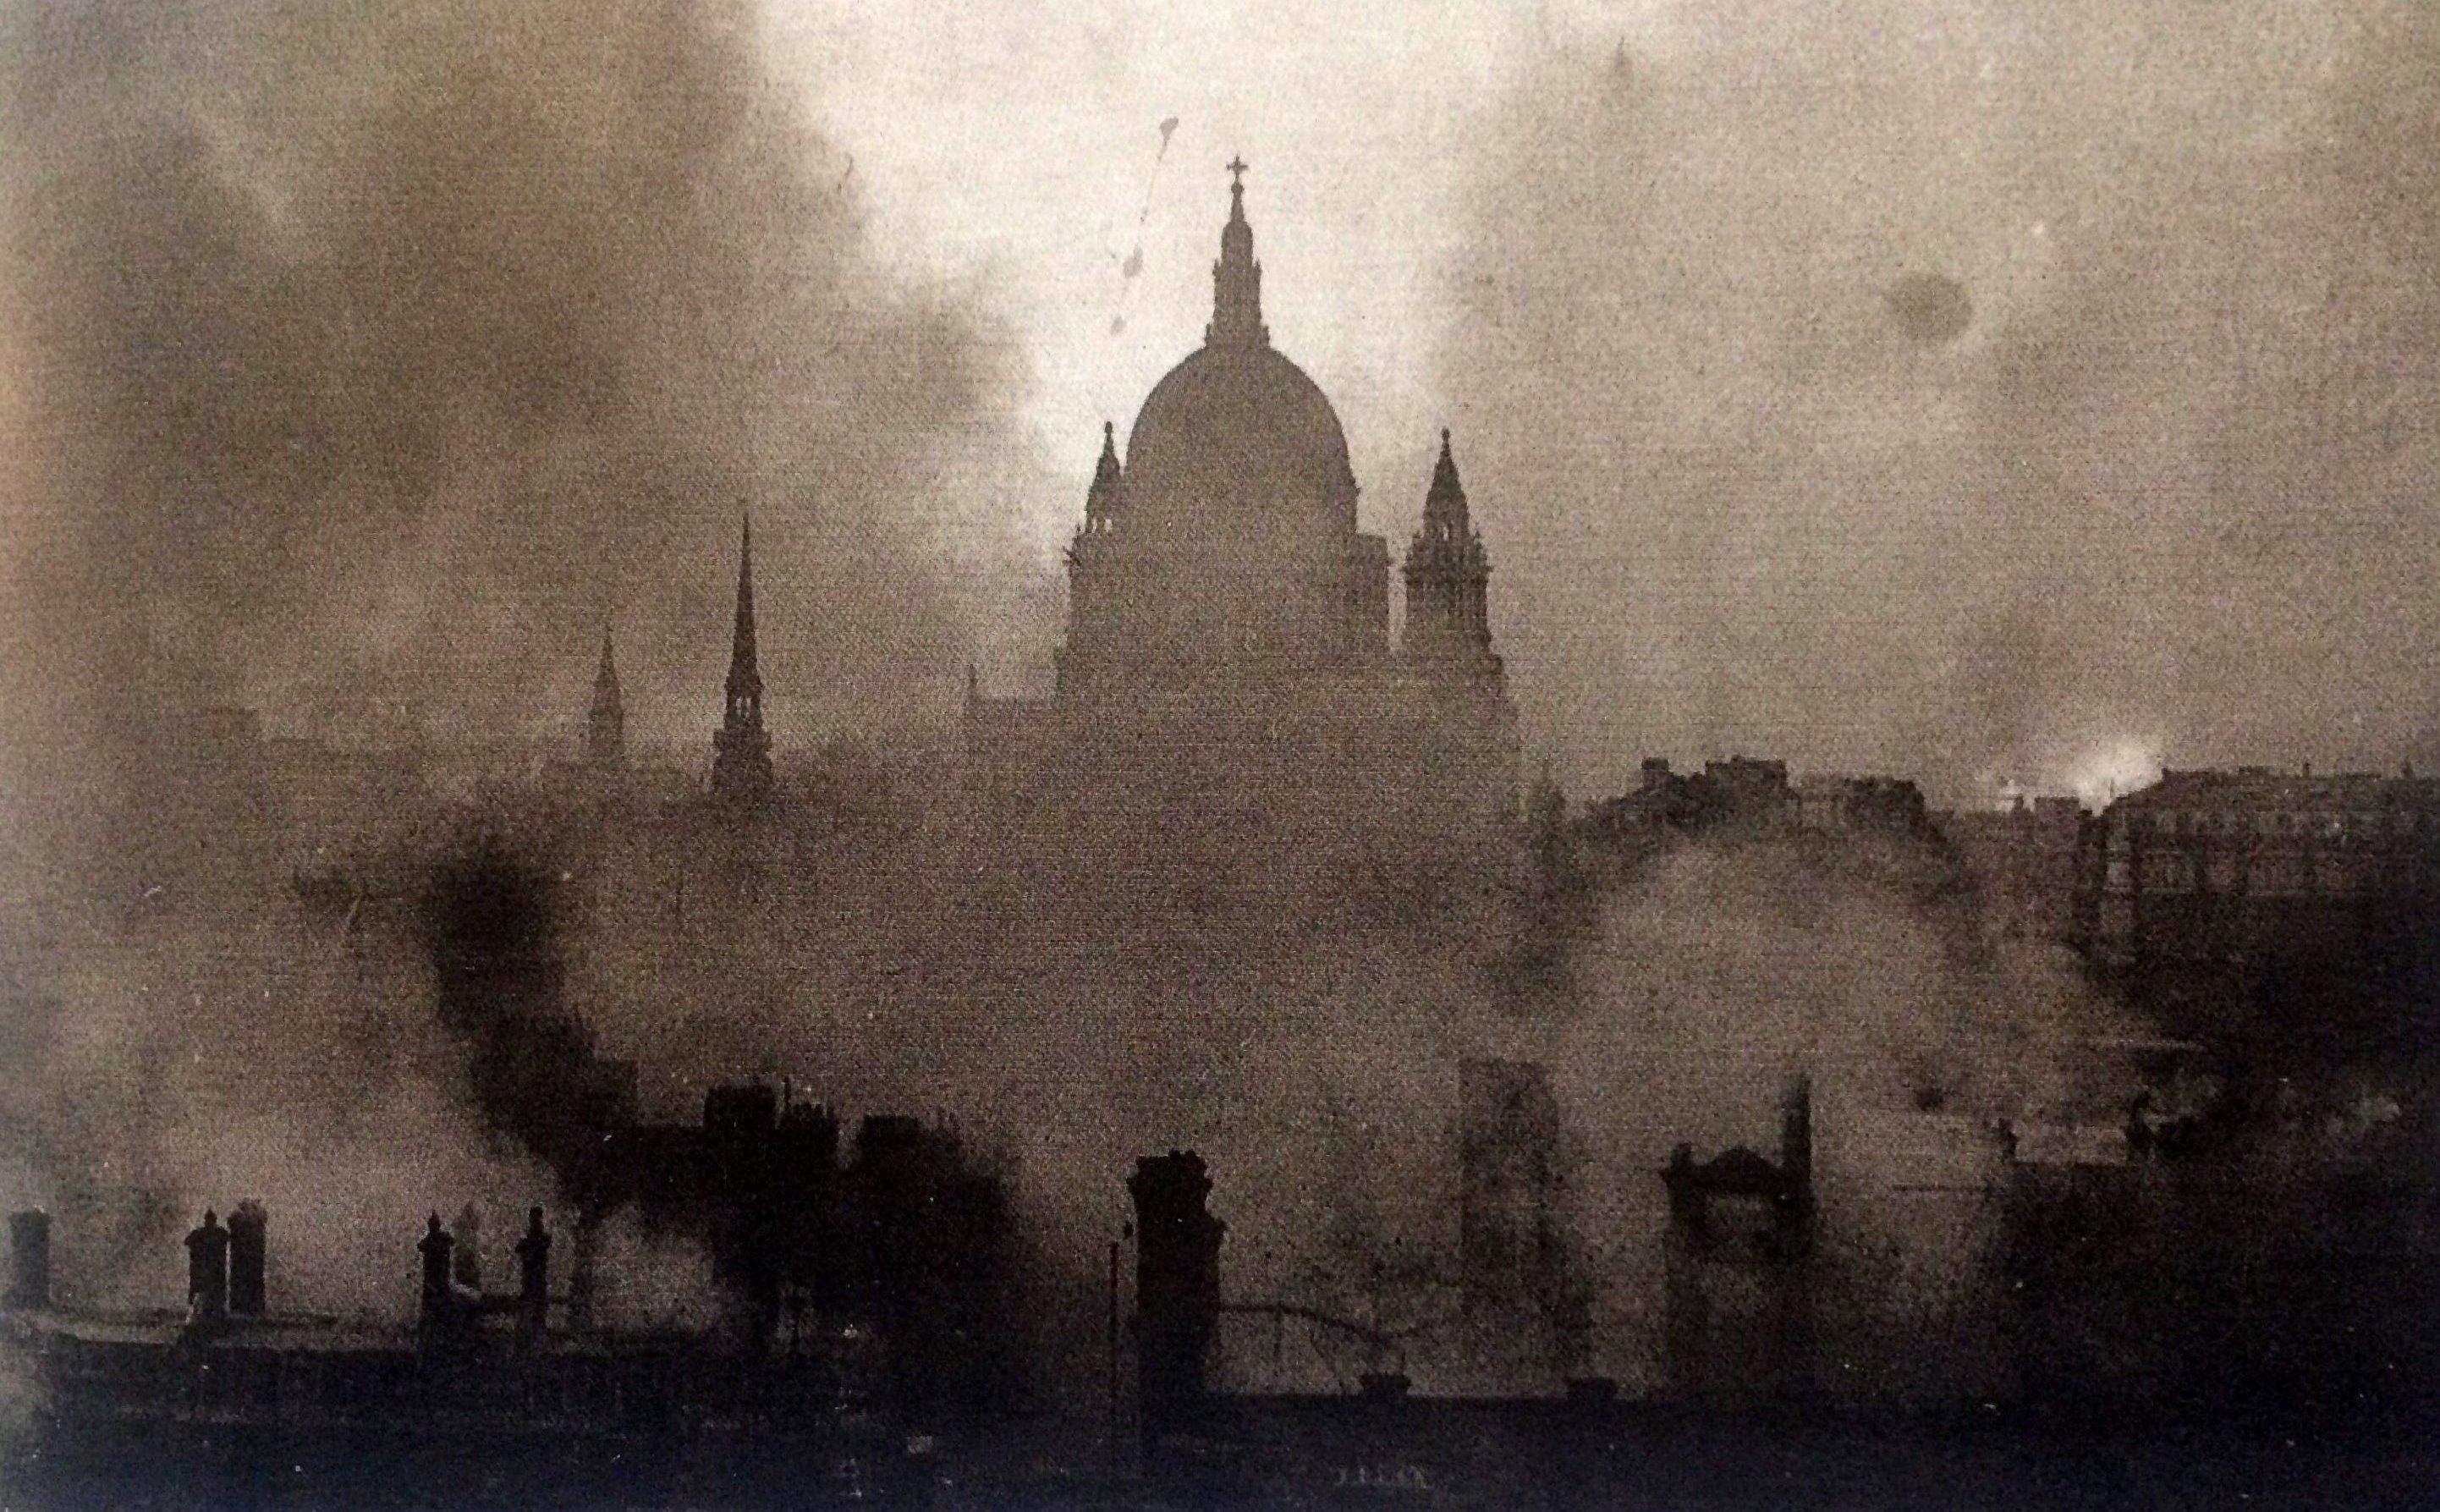 aus: Boyle, David, World War II - A Photographic History, London 2001, S. 11.